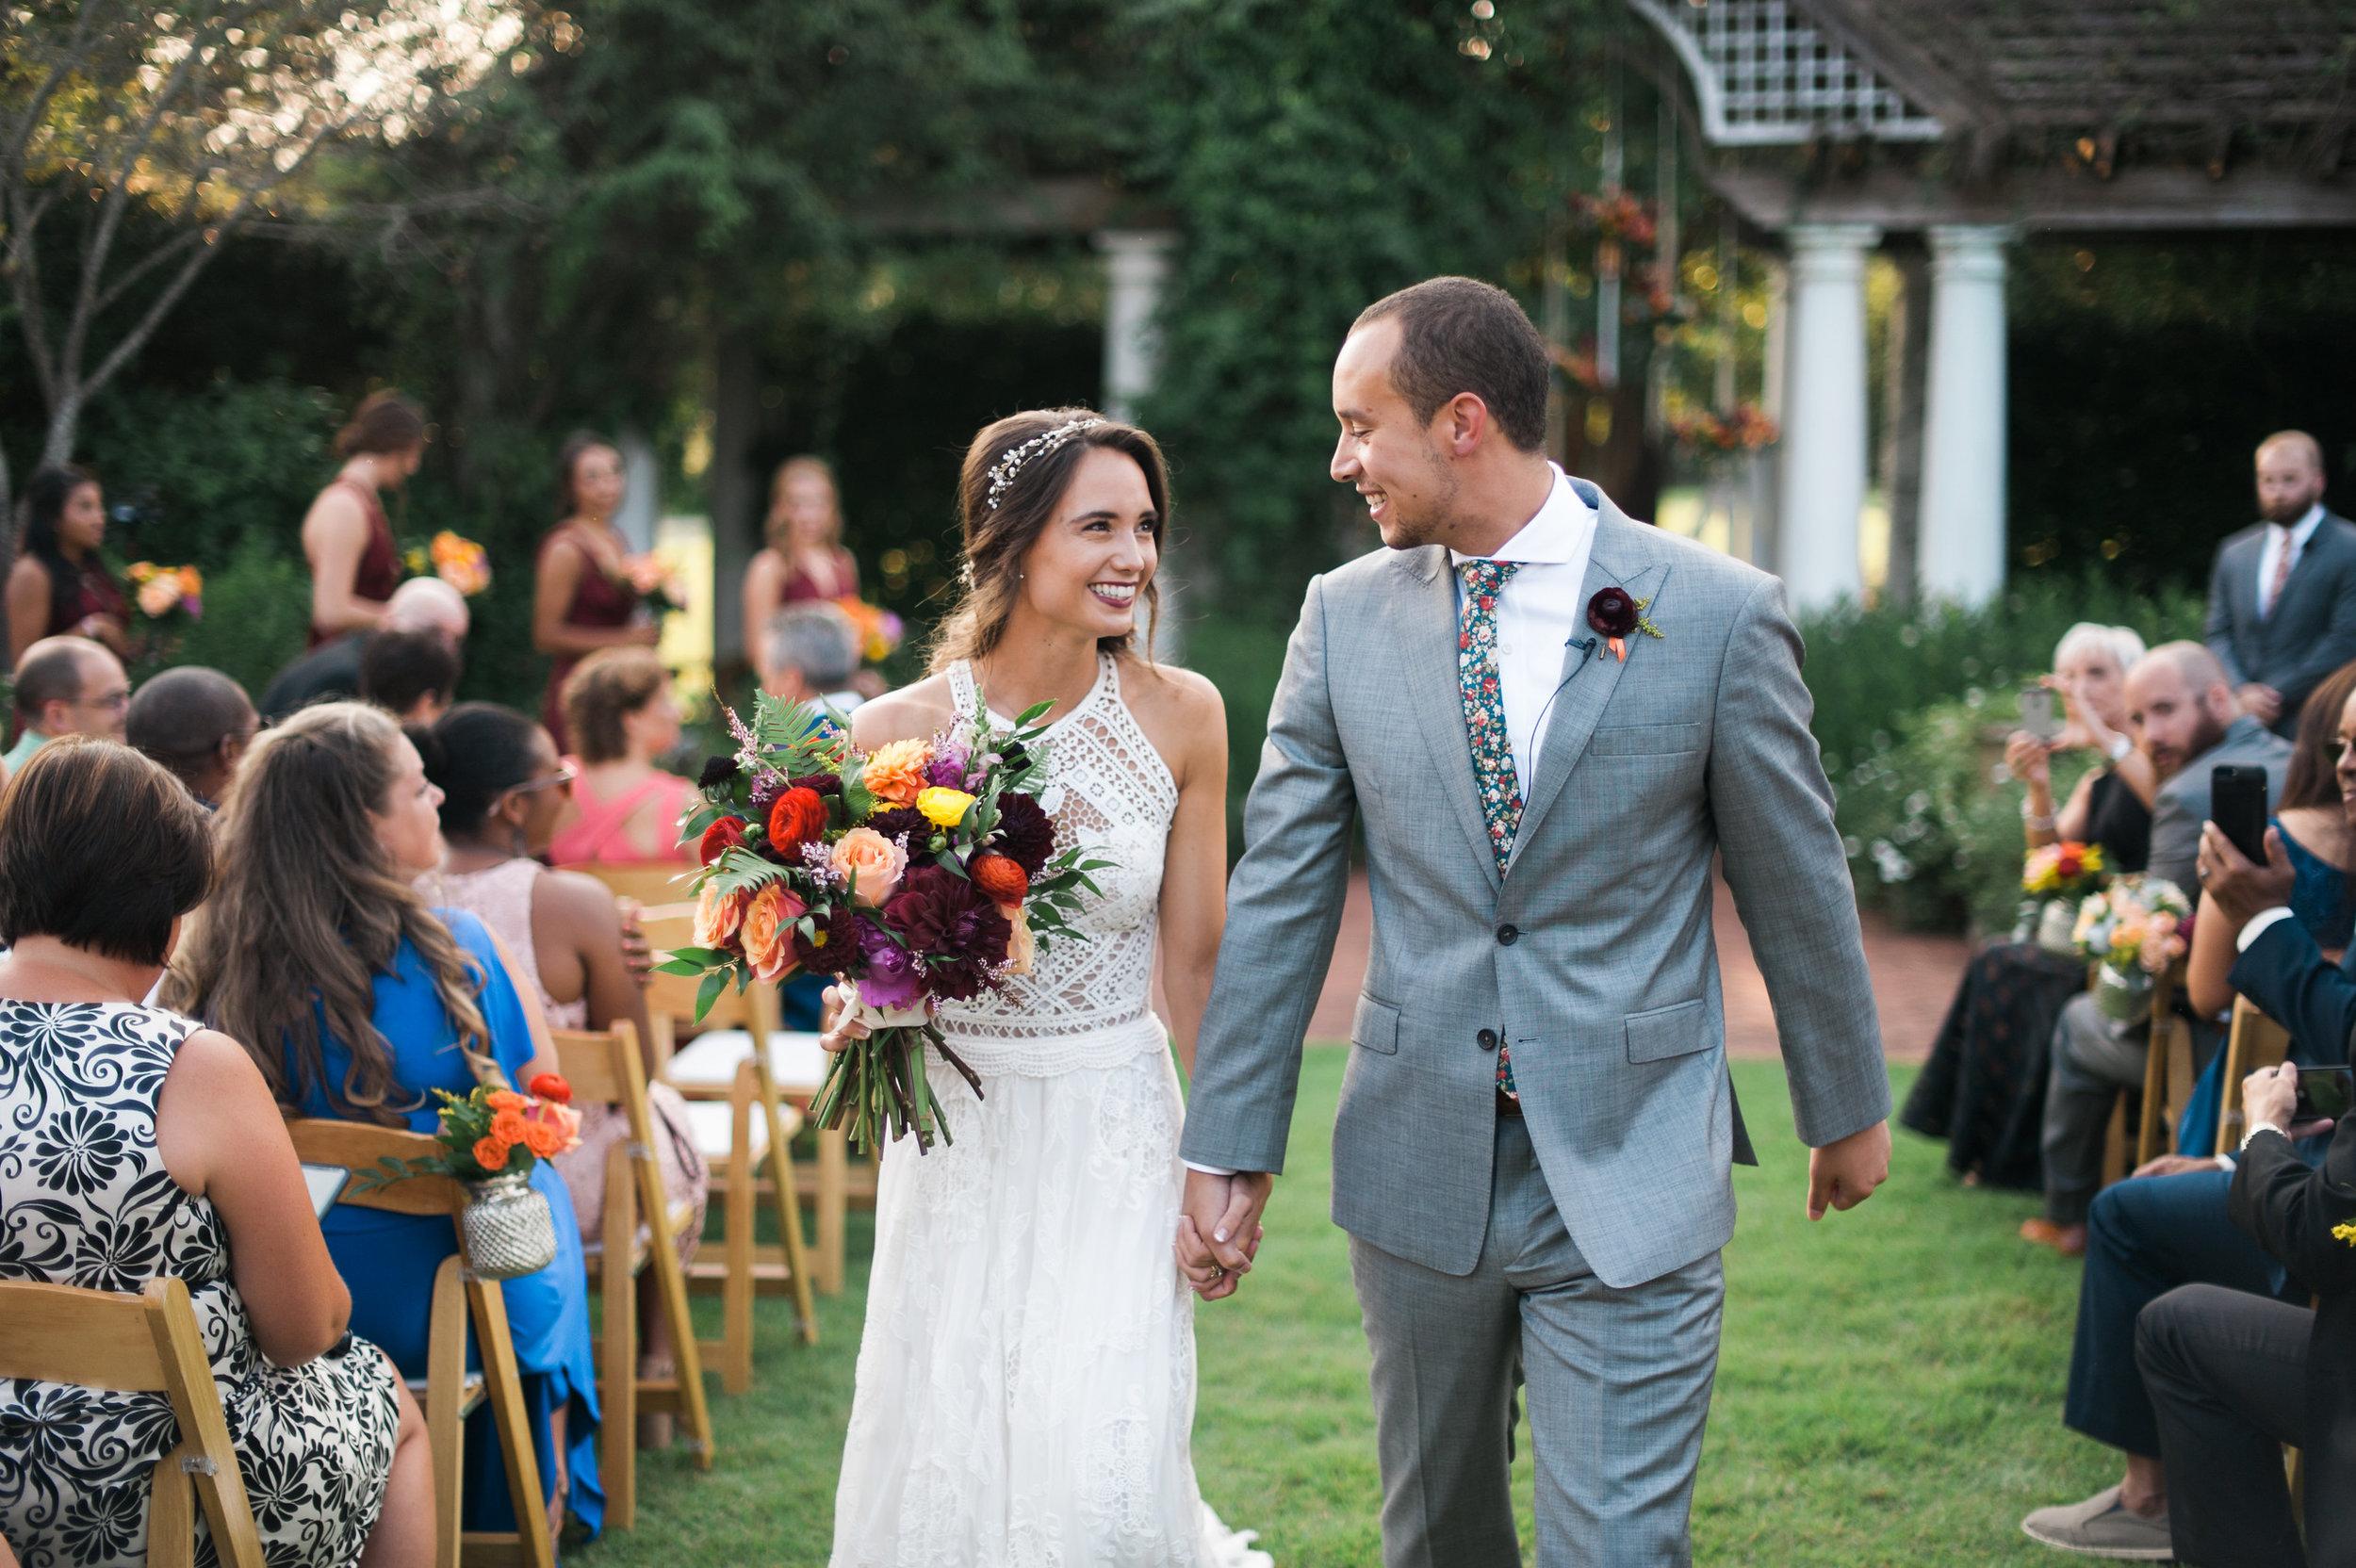 thomas-wedding-246-X5.jpg